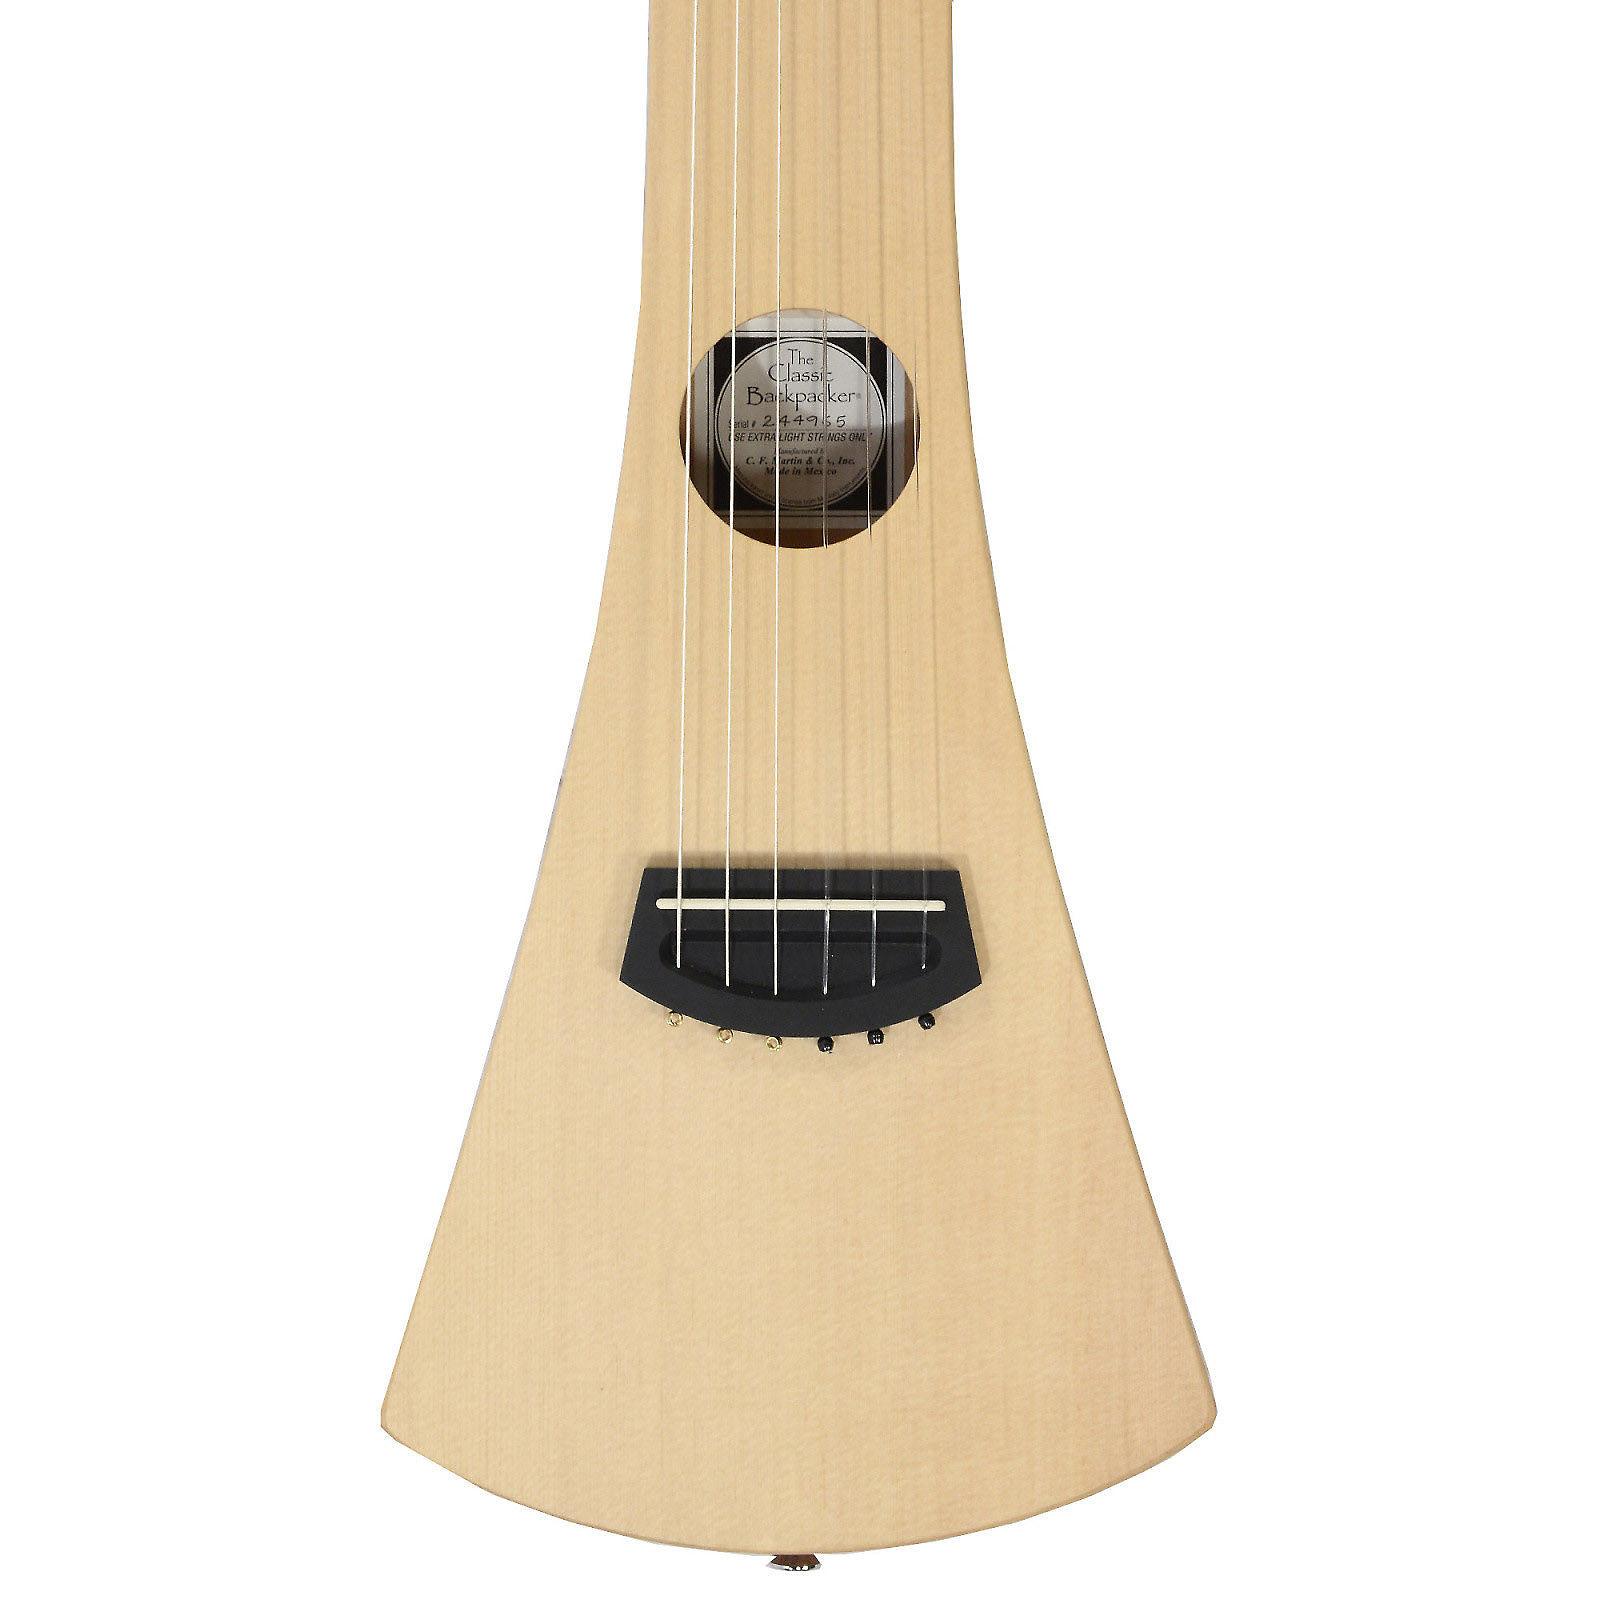 martin backpacker nylon string acoustic travel guitar. Black Bedroom Furniture Sets. Home Design Ideas